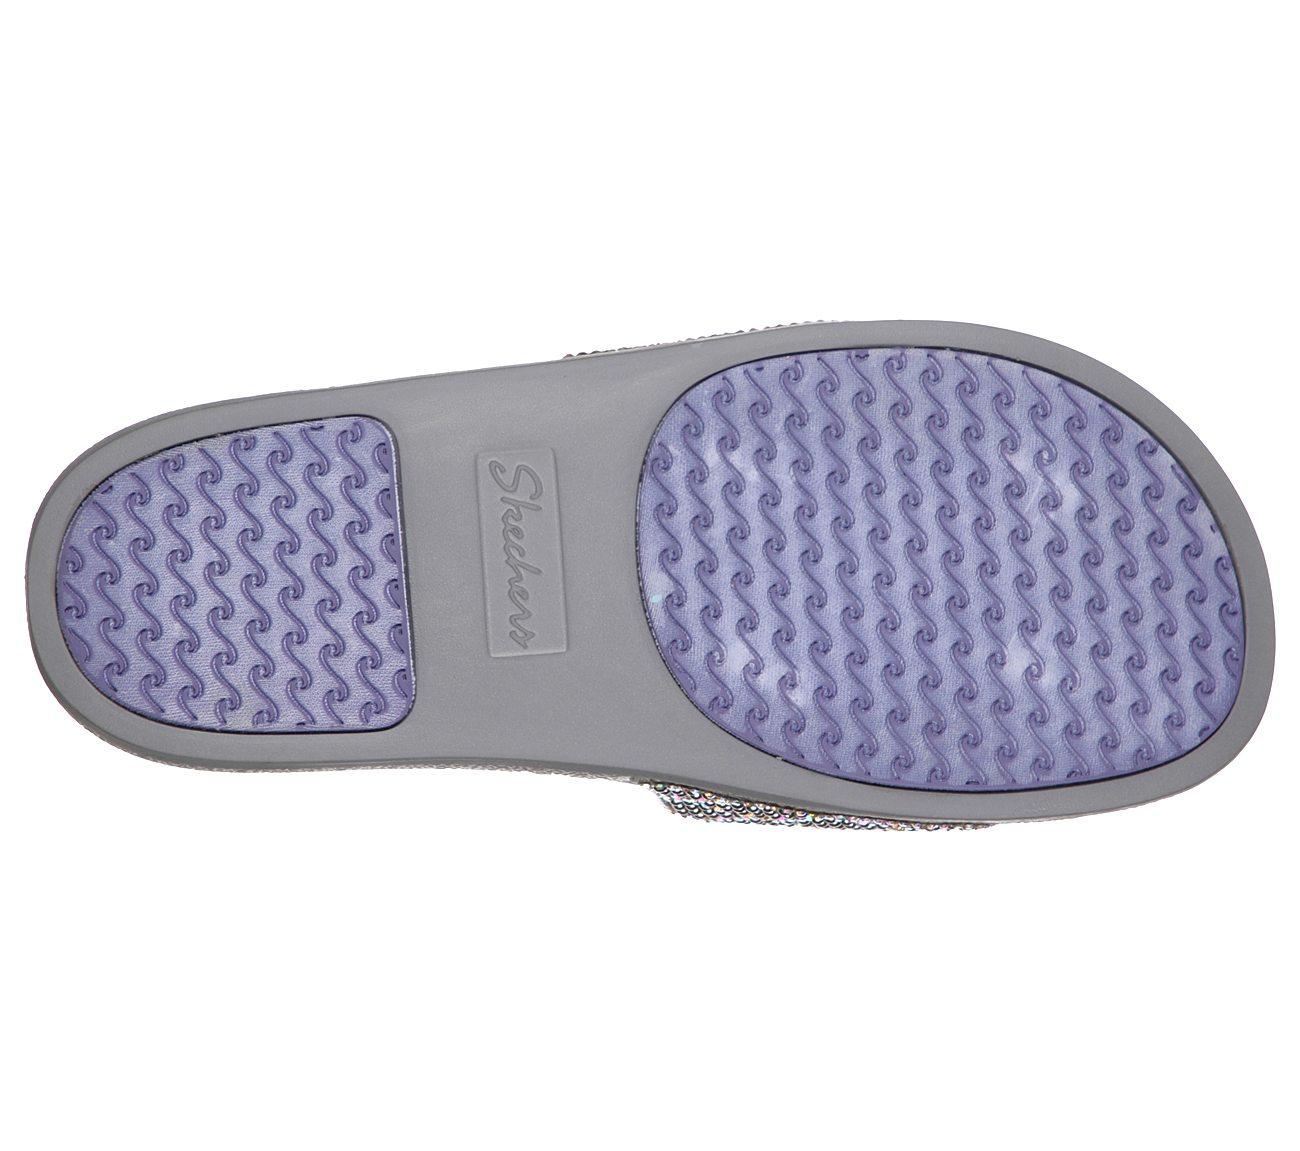 021ebf7c4658 Buy SKECHERS Pop Ups - Dazzle Razzle SKECHERS Cali Shoes only £35.00